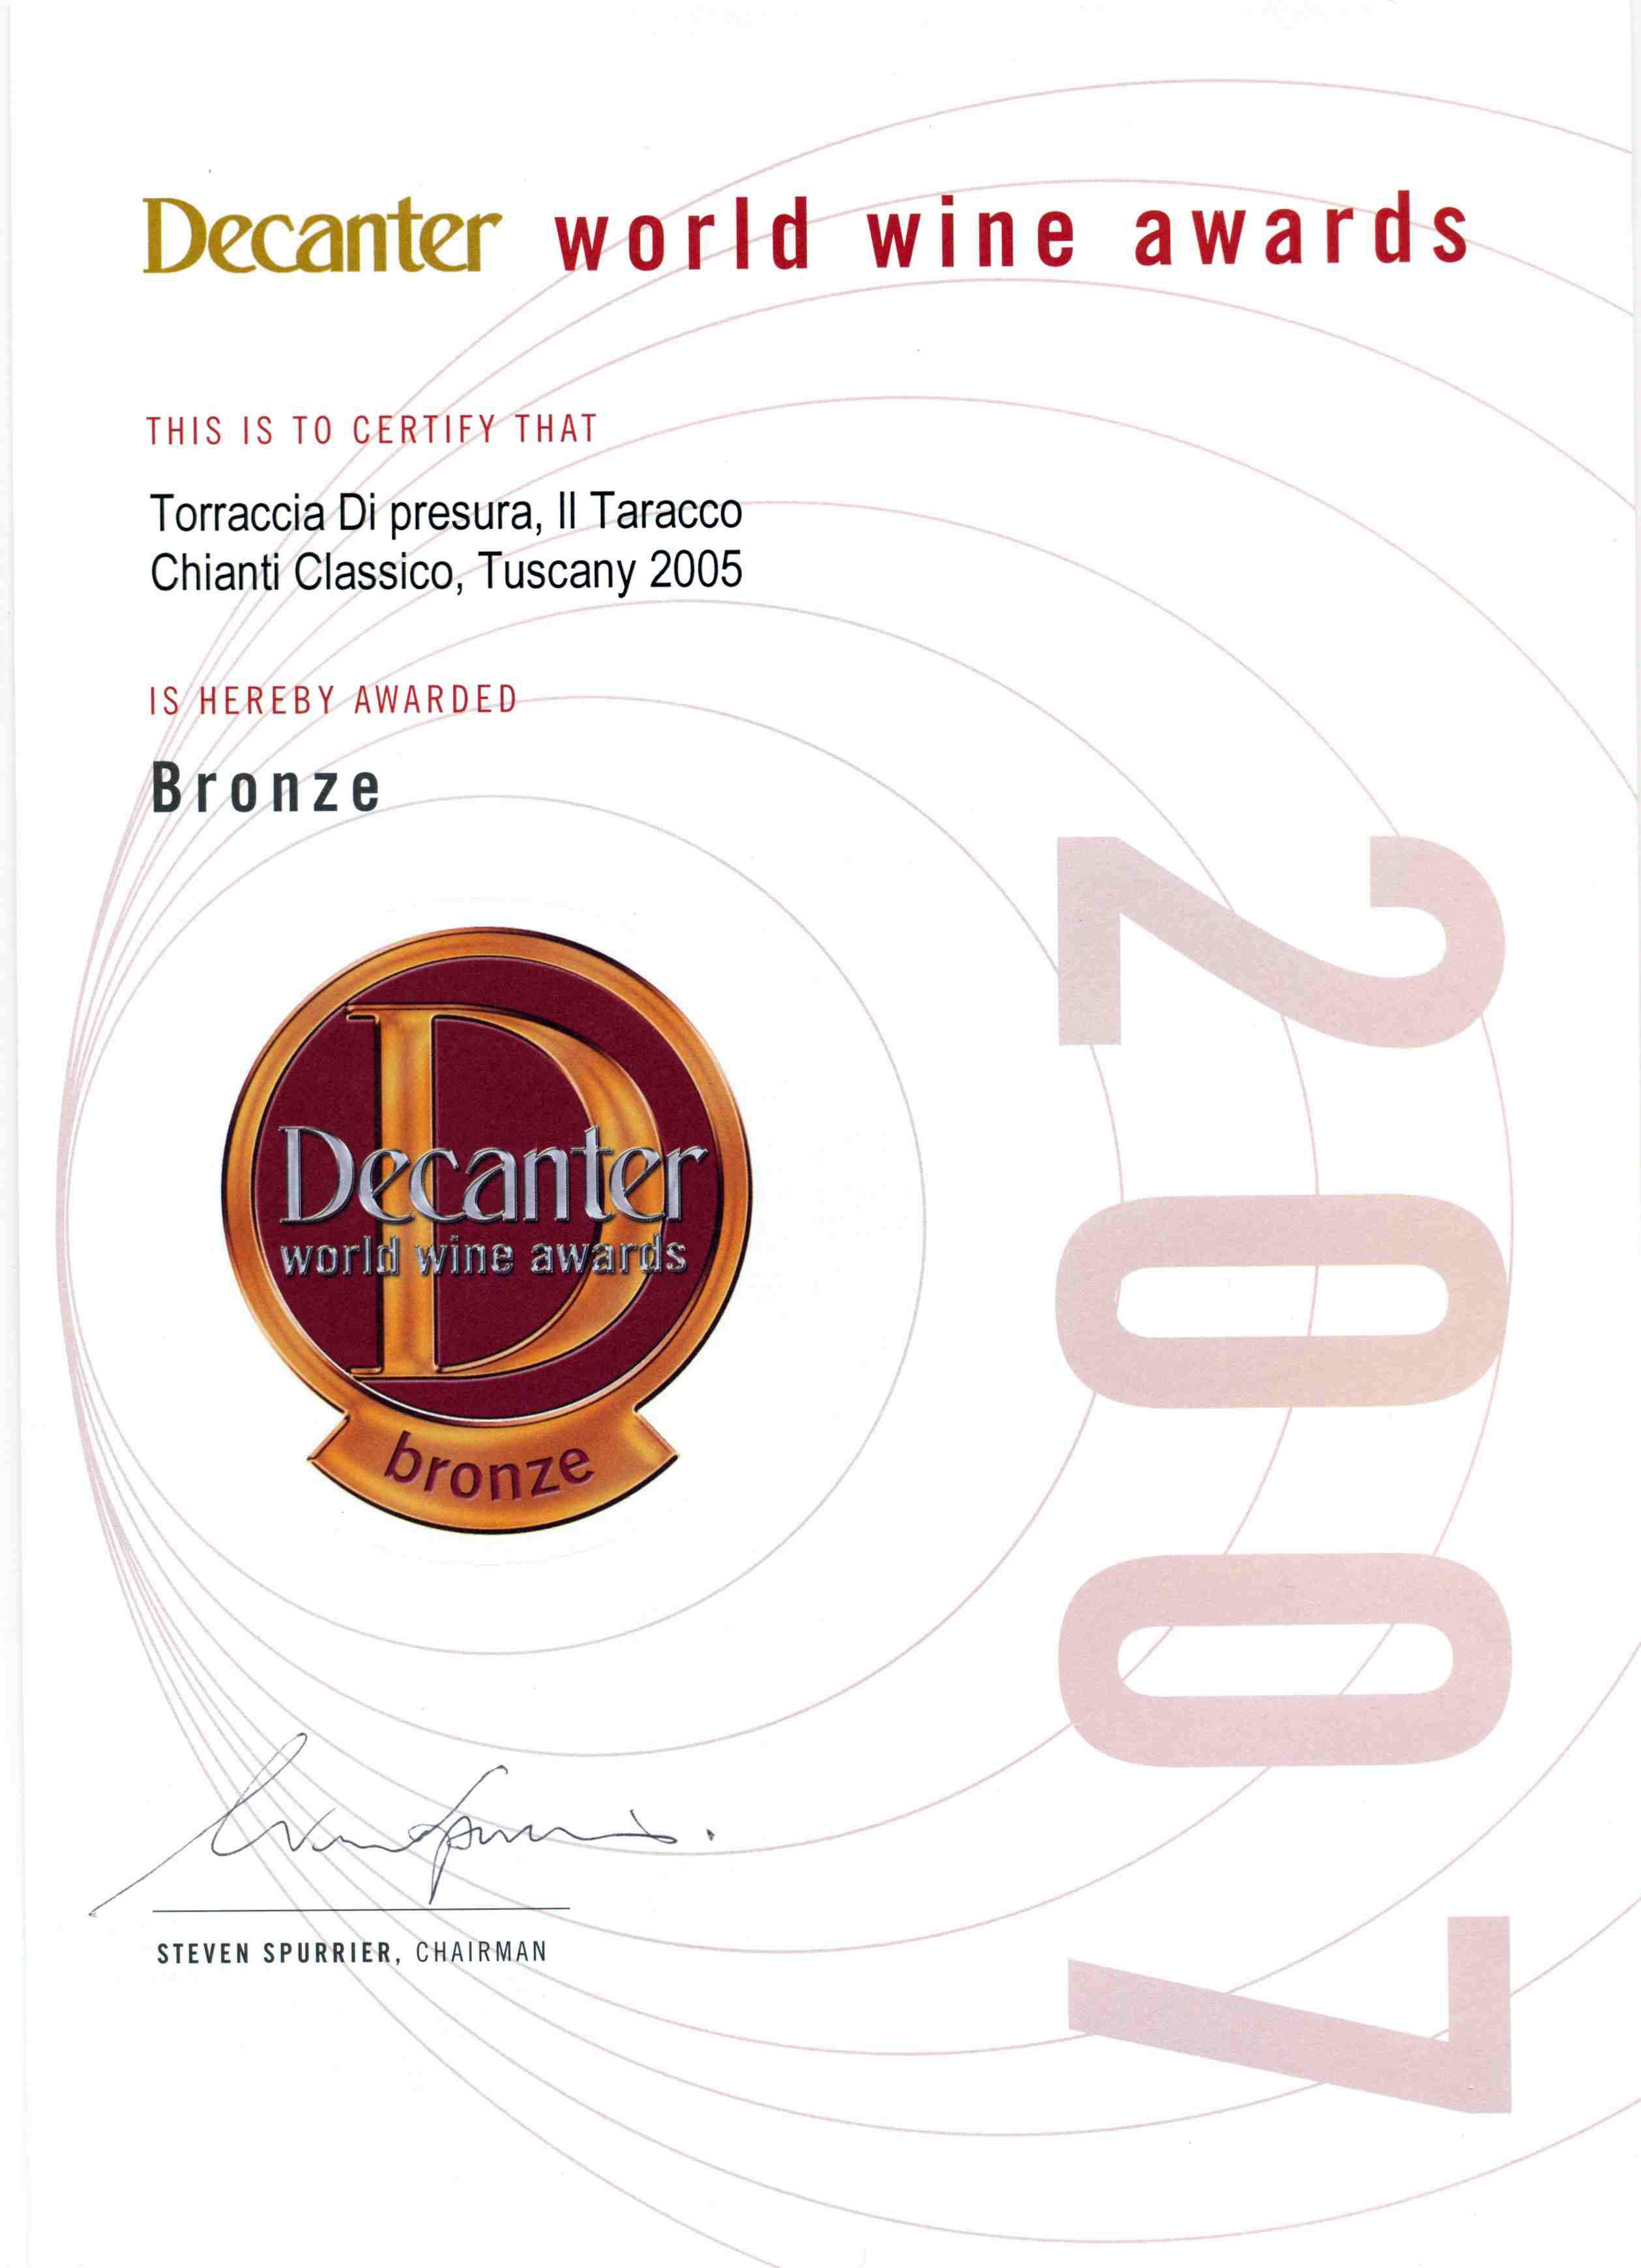 44 TAR 2005 Decanter 2007 2007